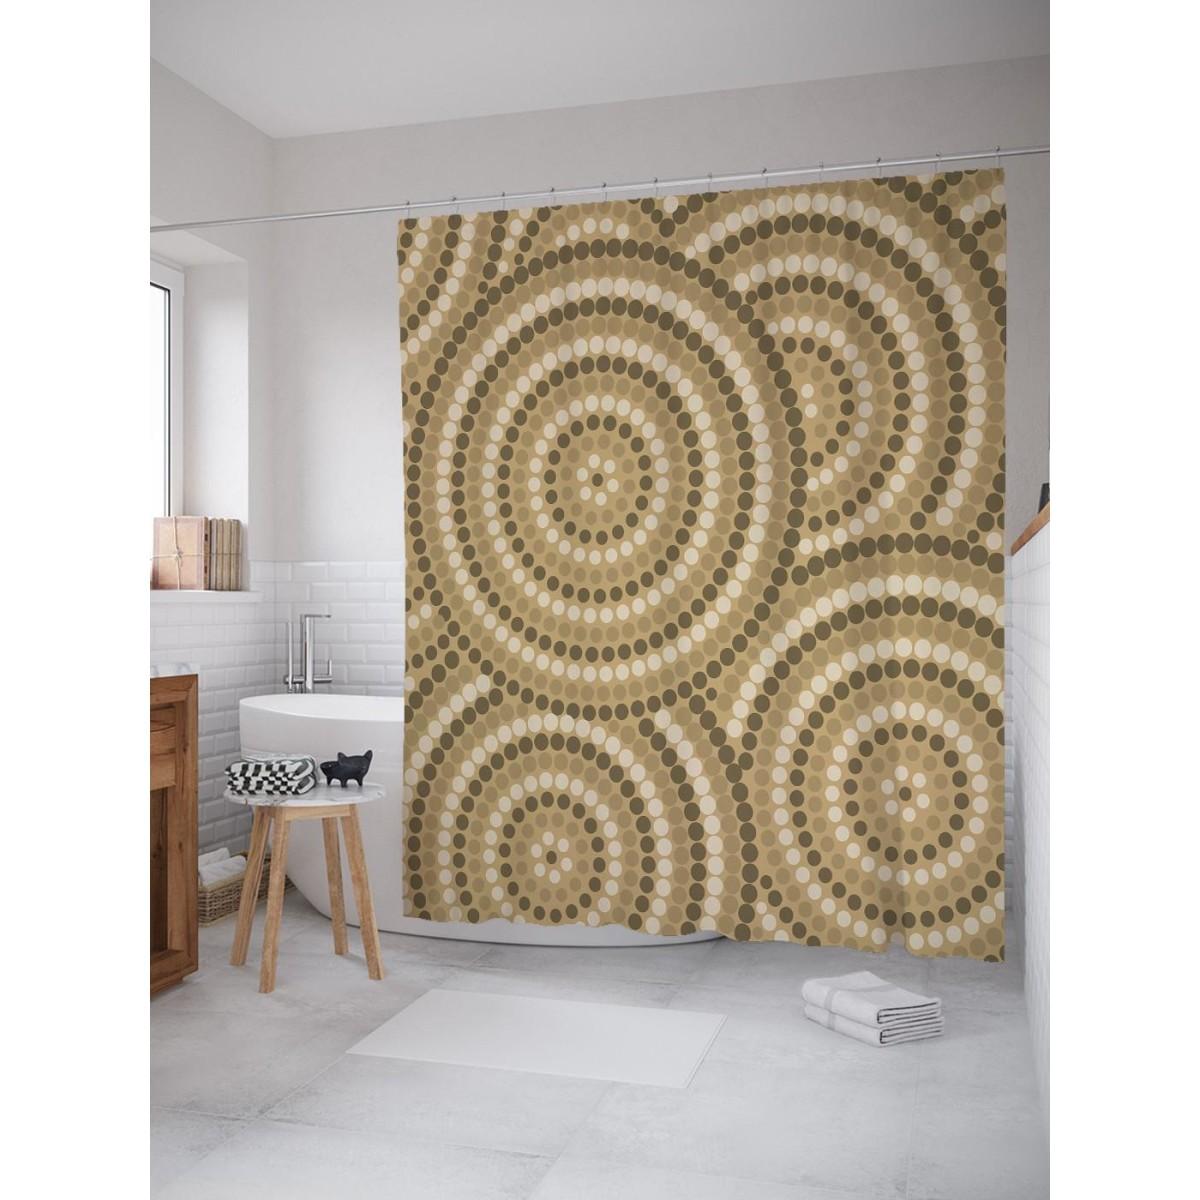 Шторка для ванной Аборигенная картина многоточия 180х200 см